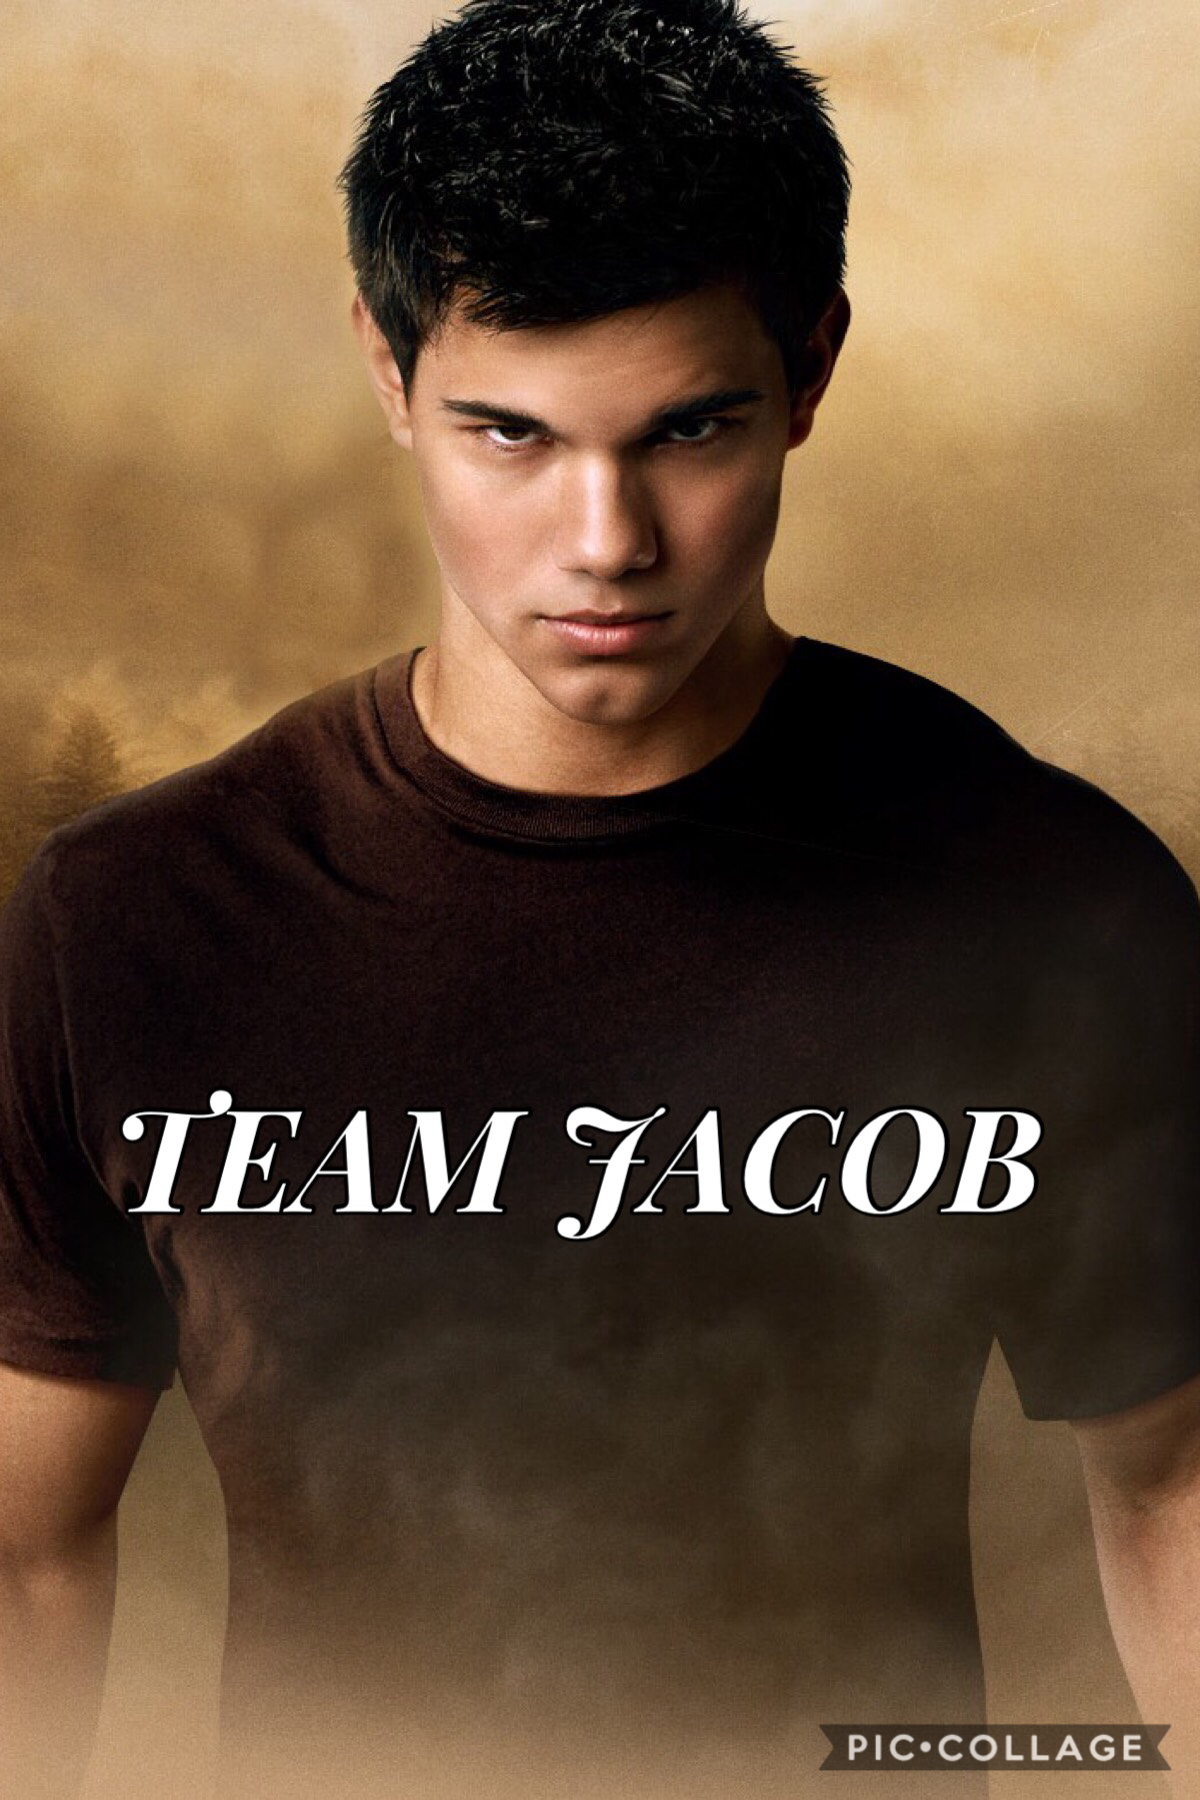 TEAM JACOB!🐺❤️